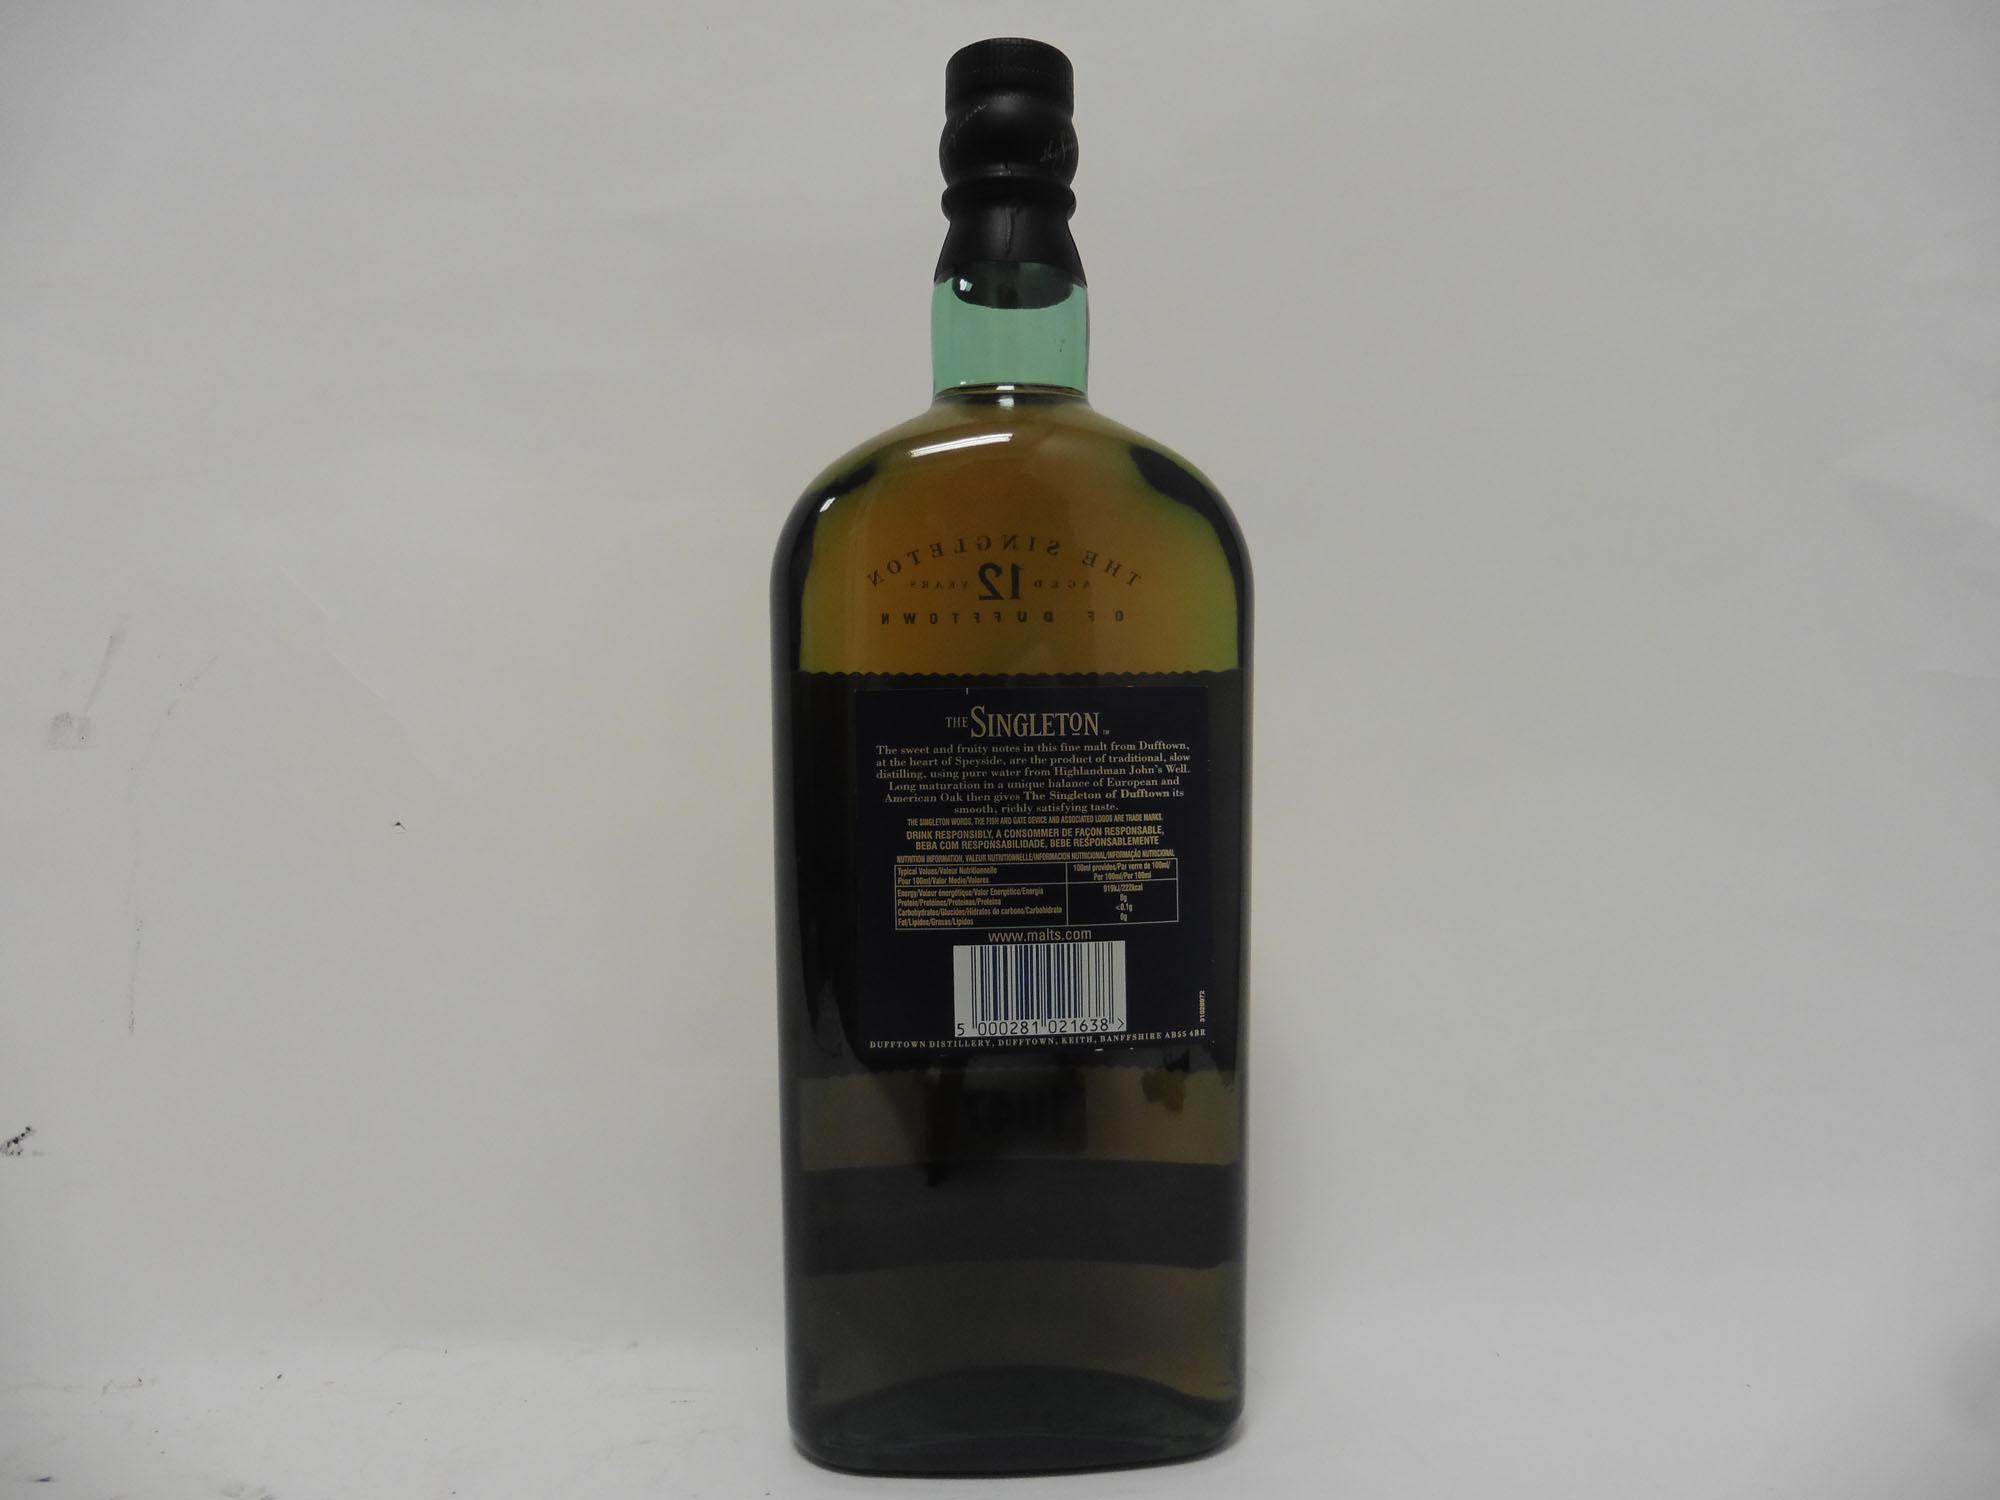 A bottle of The Singleton 12 year old Single Malt Scotch Whisky, - Image 2 of 2